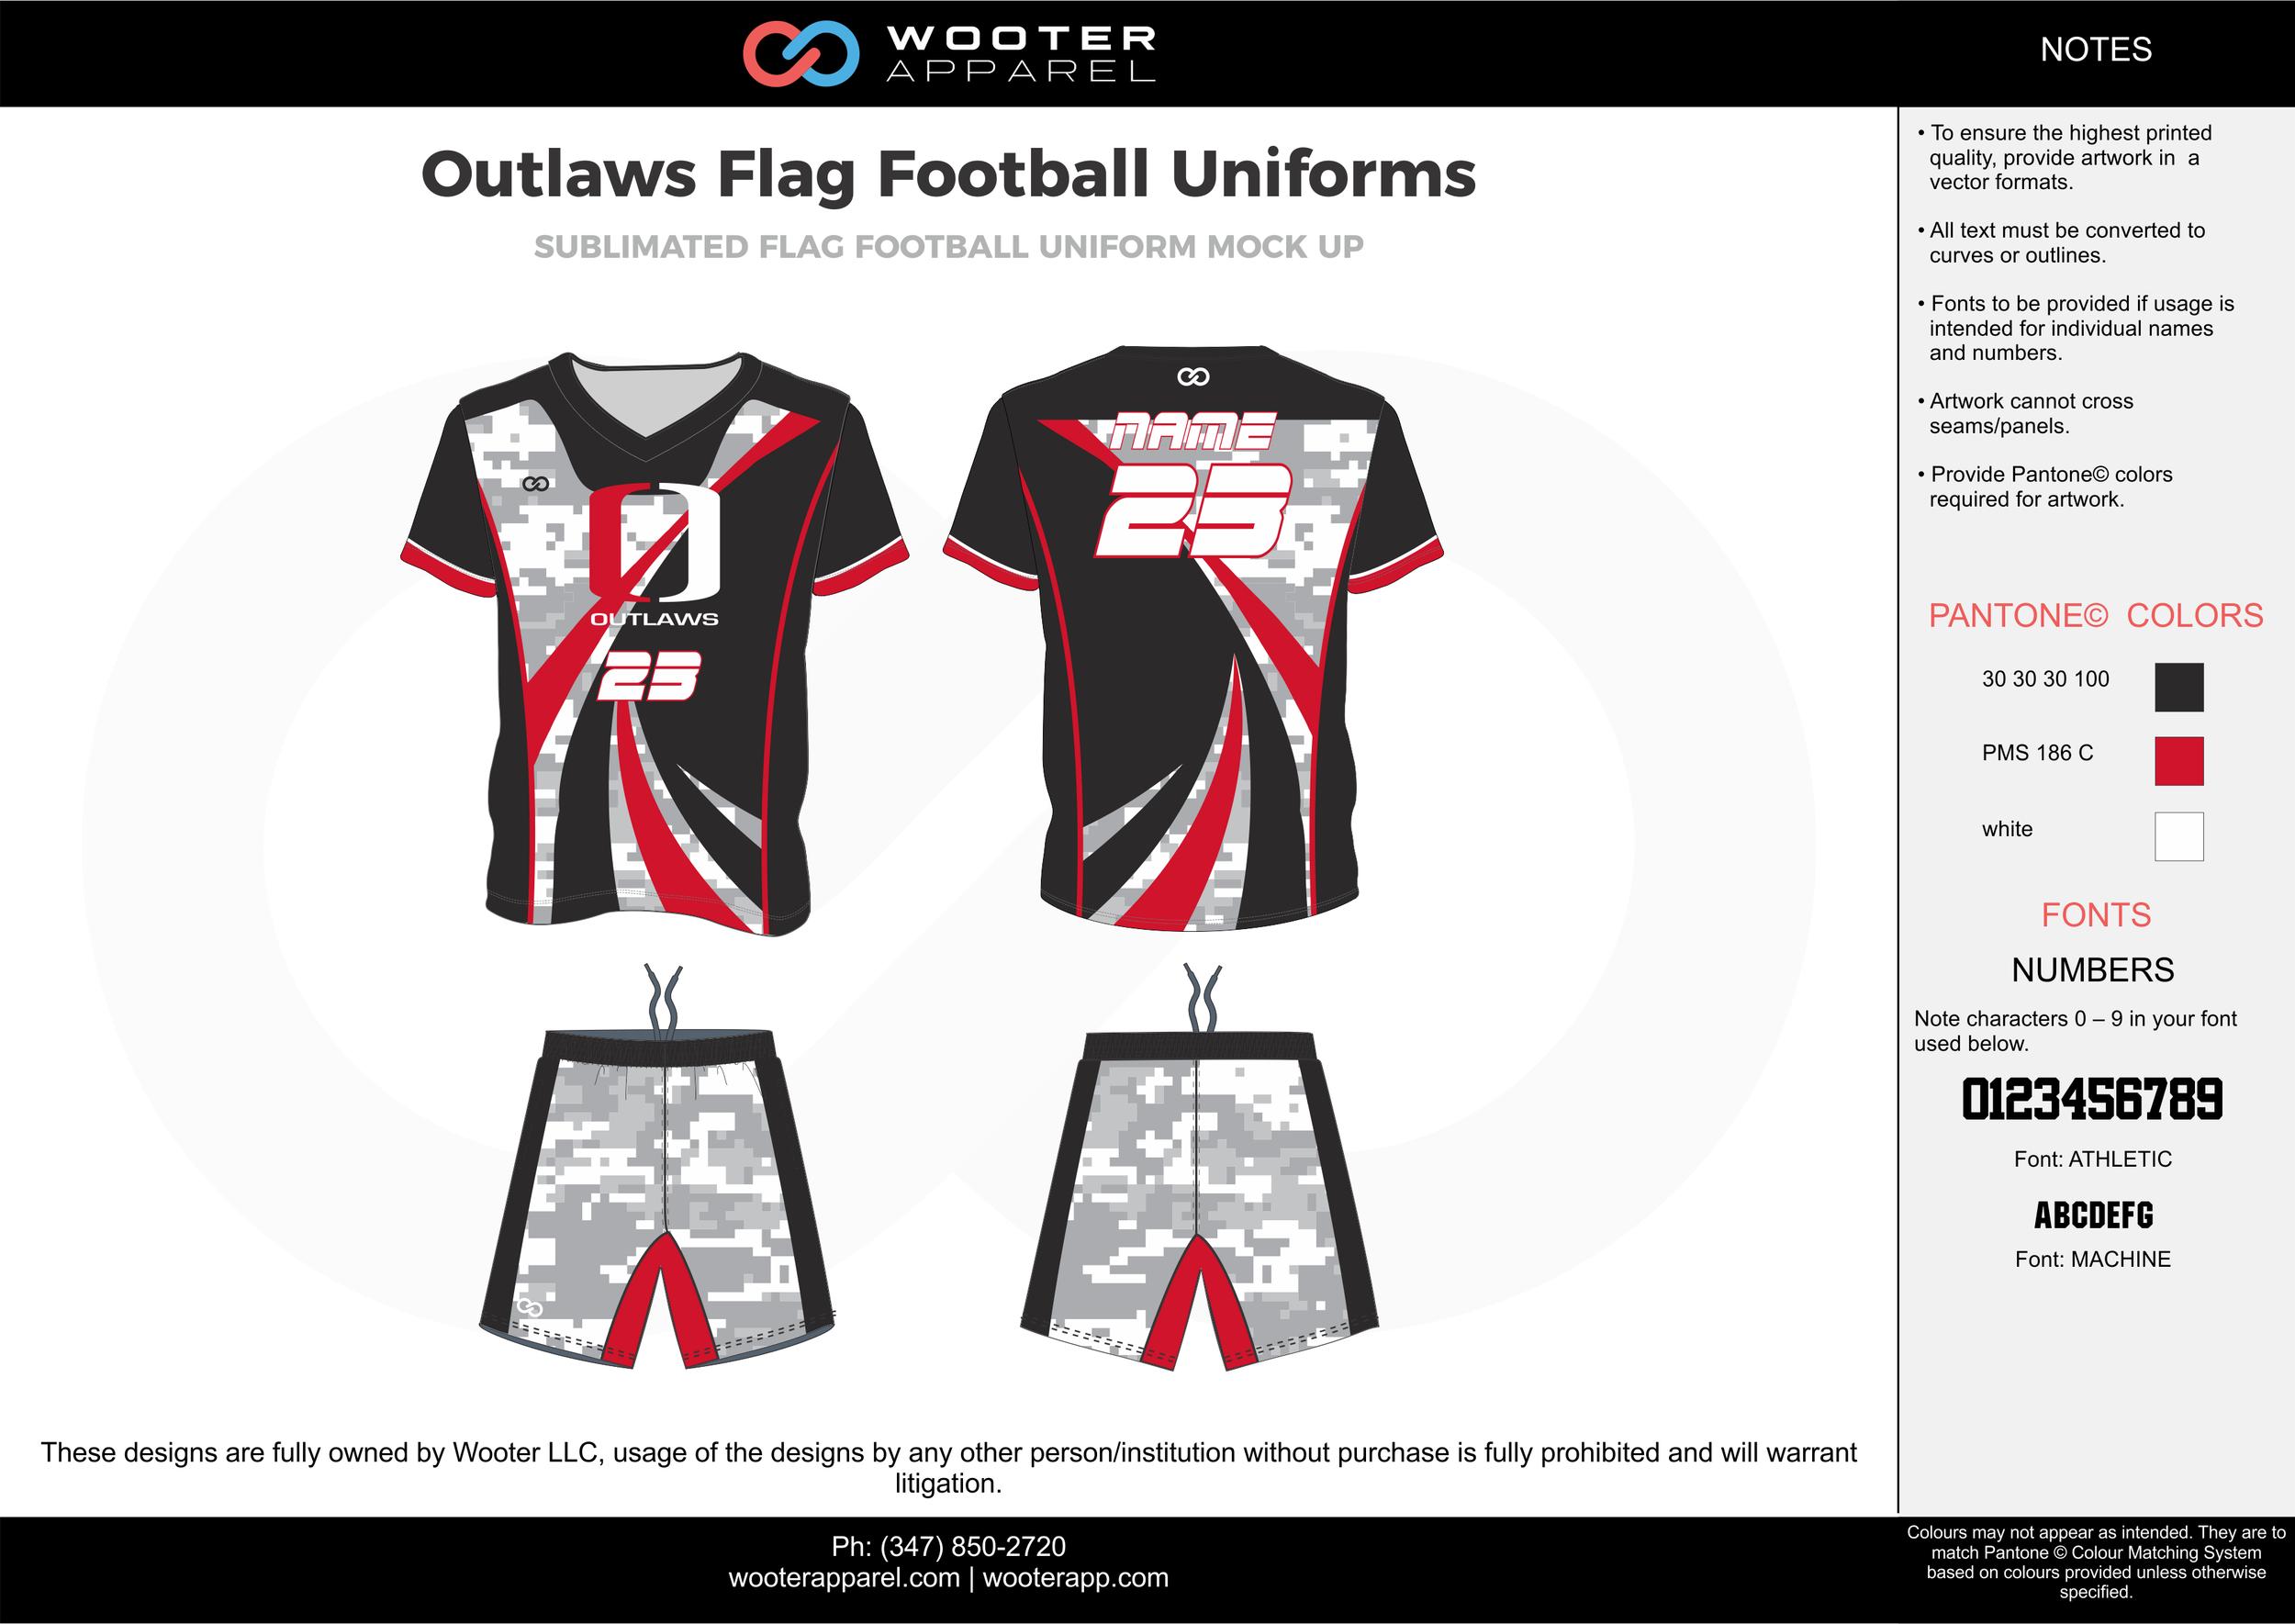 OUTLAWS Flag Football Uniform red gray black white flag football uniforms jerseys shorts